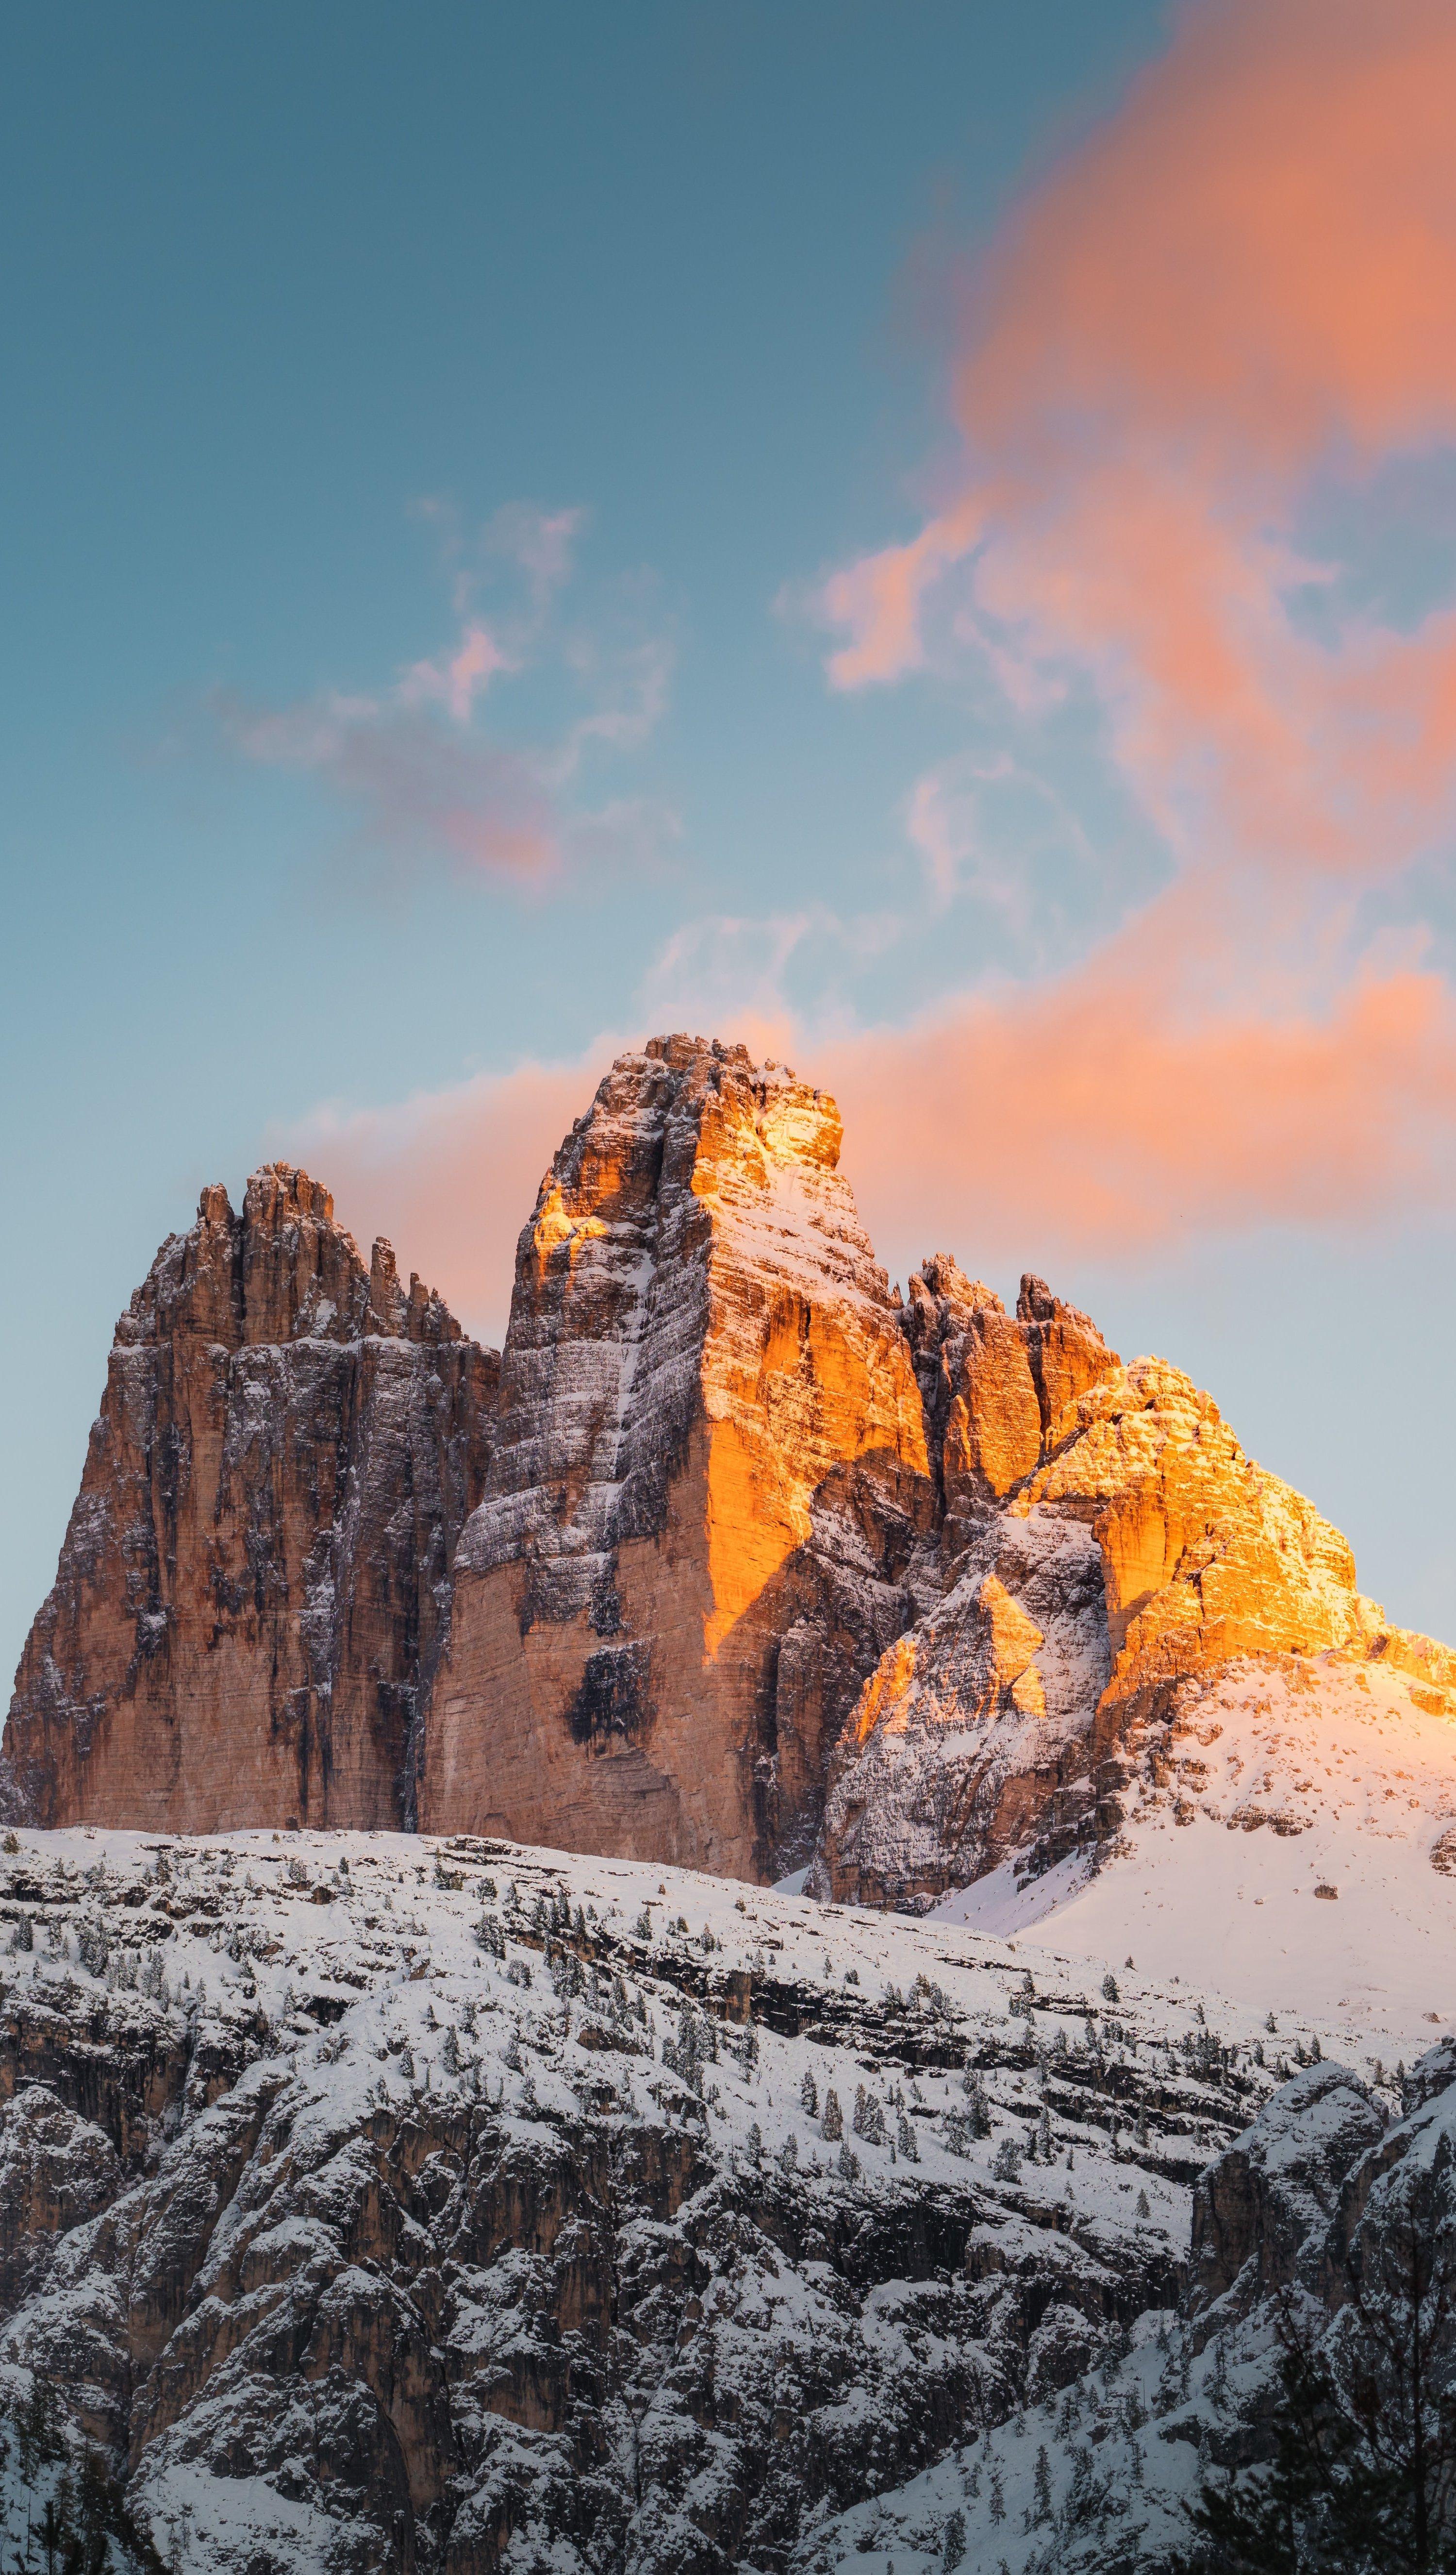 Fondos de pantalla Montañas cubiertas de nieve al atardecer Vertical